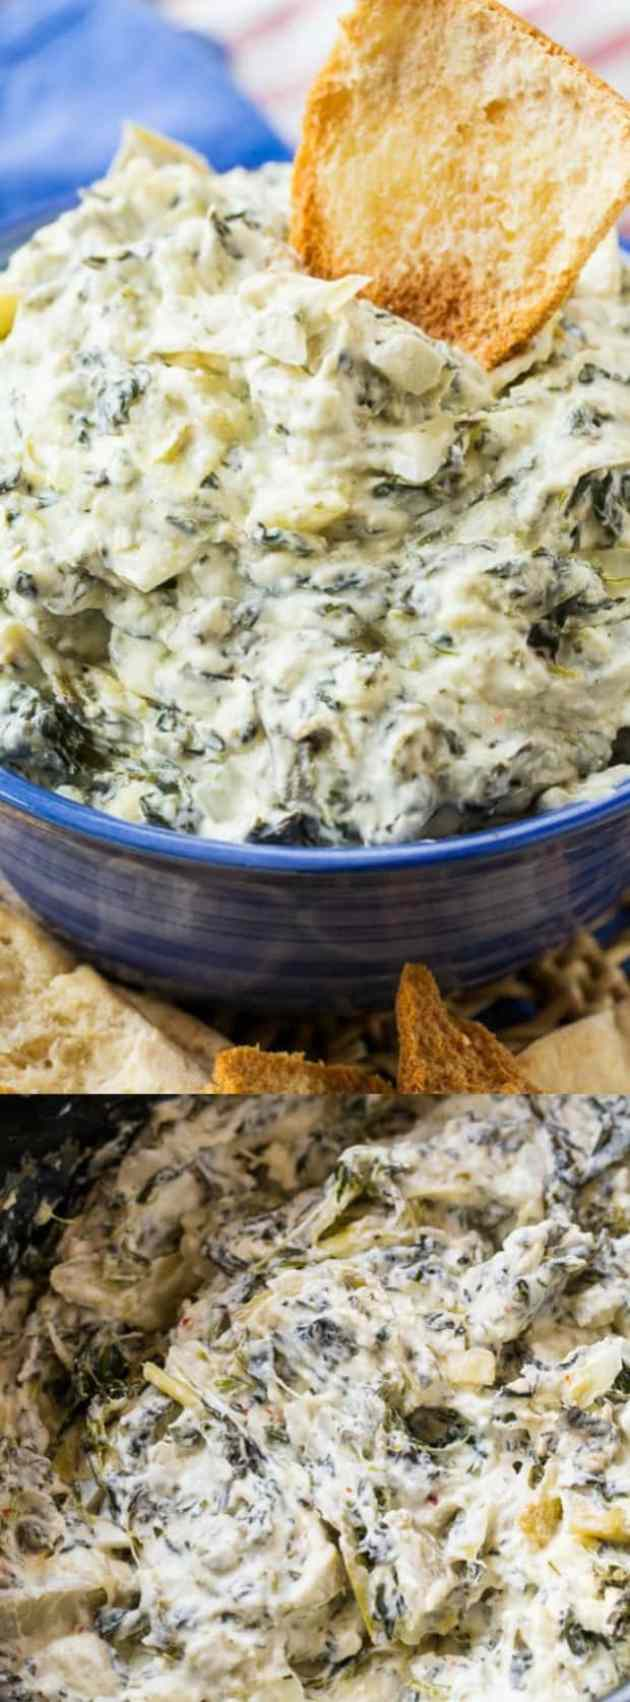 Crock Pot Spinach Artichoke Dip Longpin